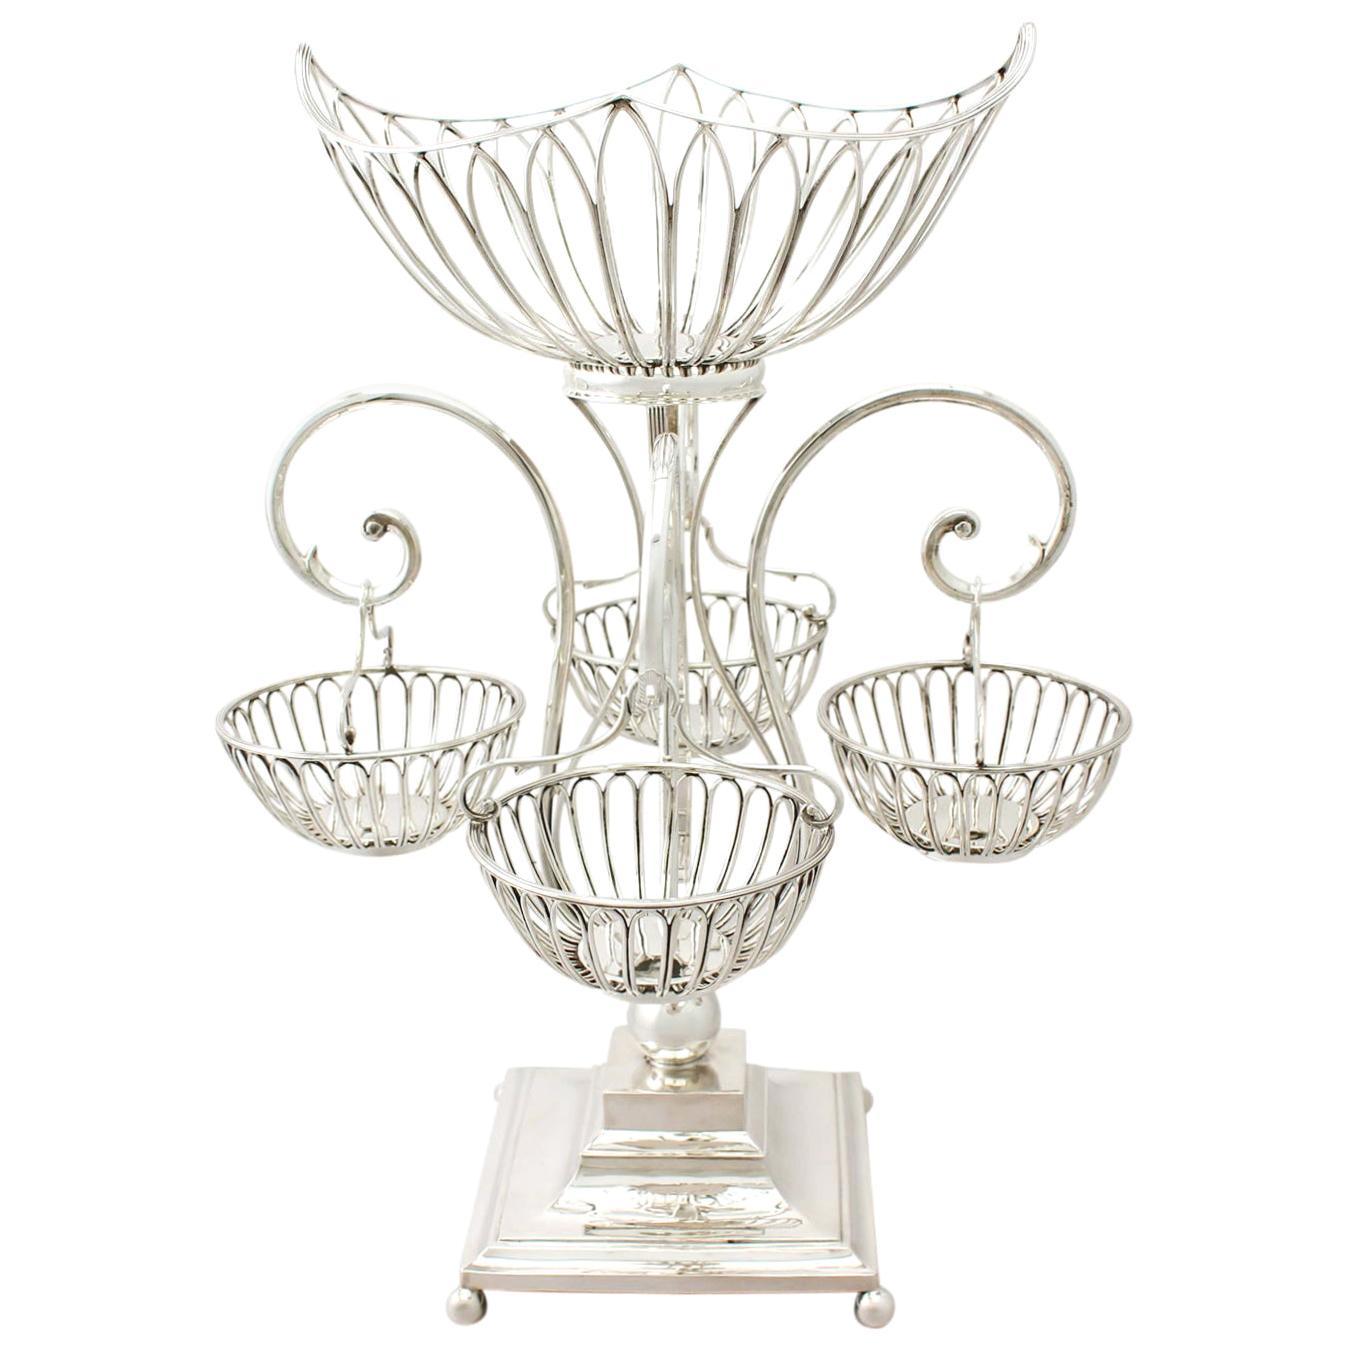 Antique Edwardian Sterling Silver Epergne Centrepiece